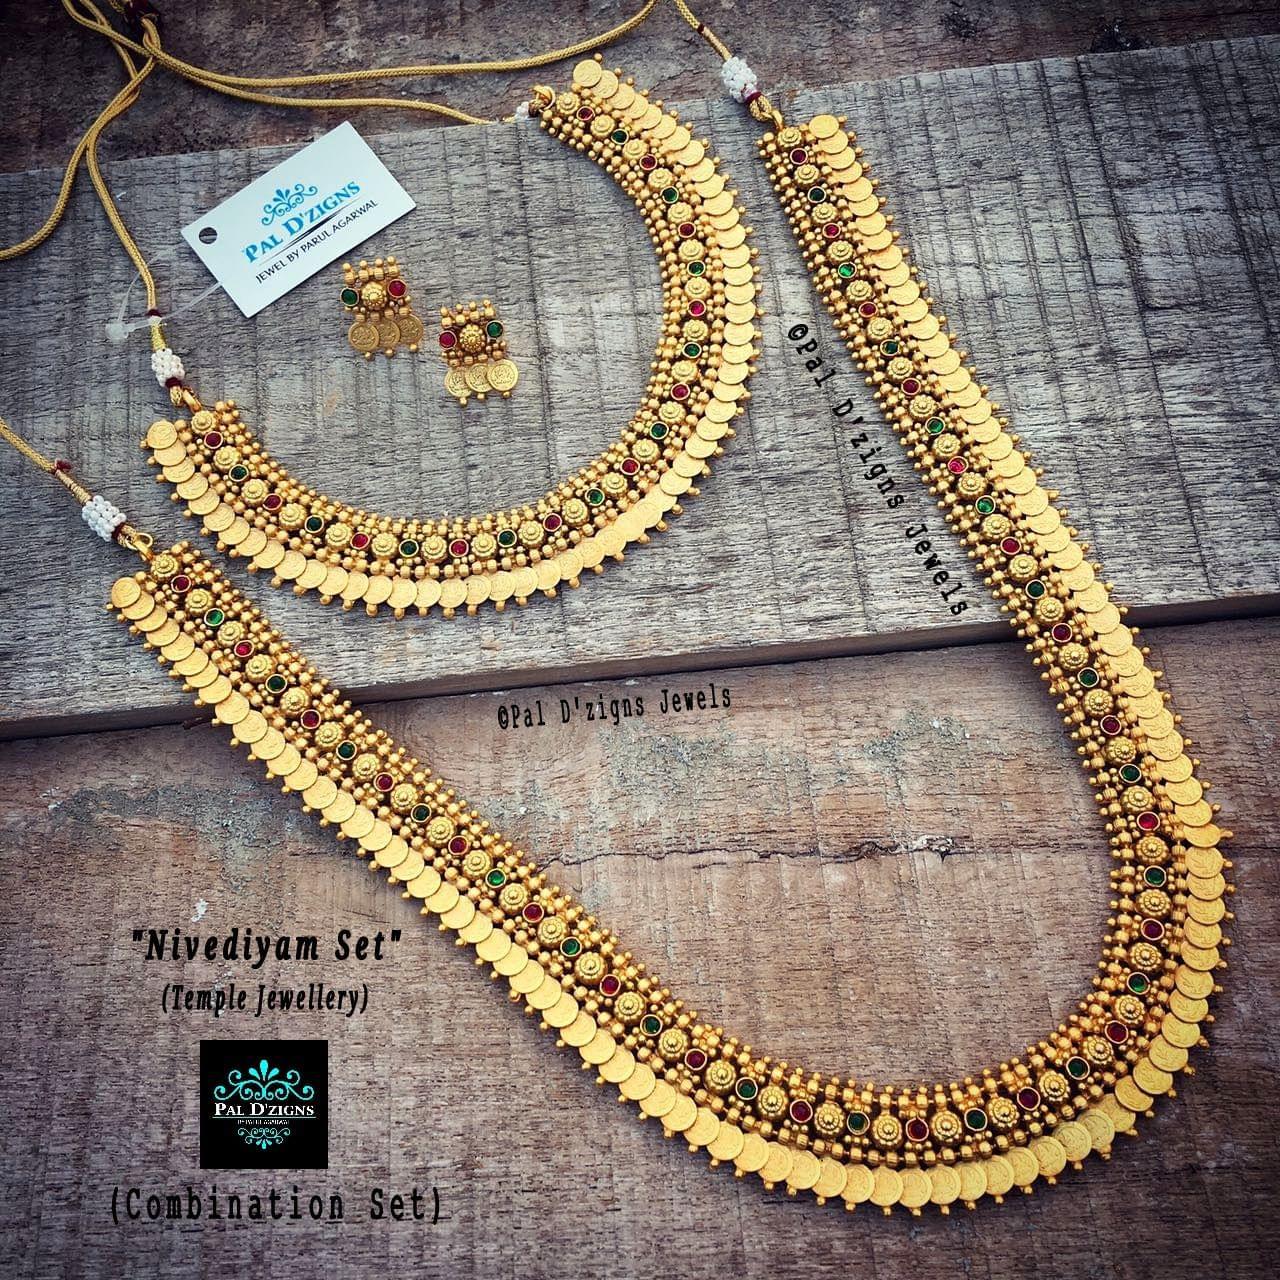 Nivediyam Combo Set -Temple Jewellery